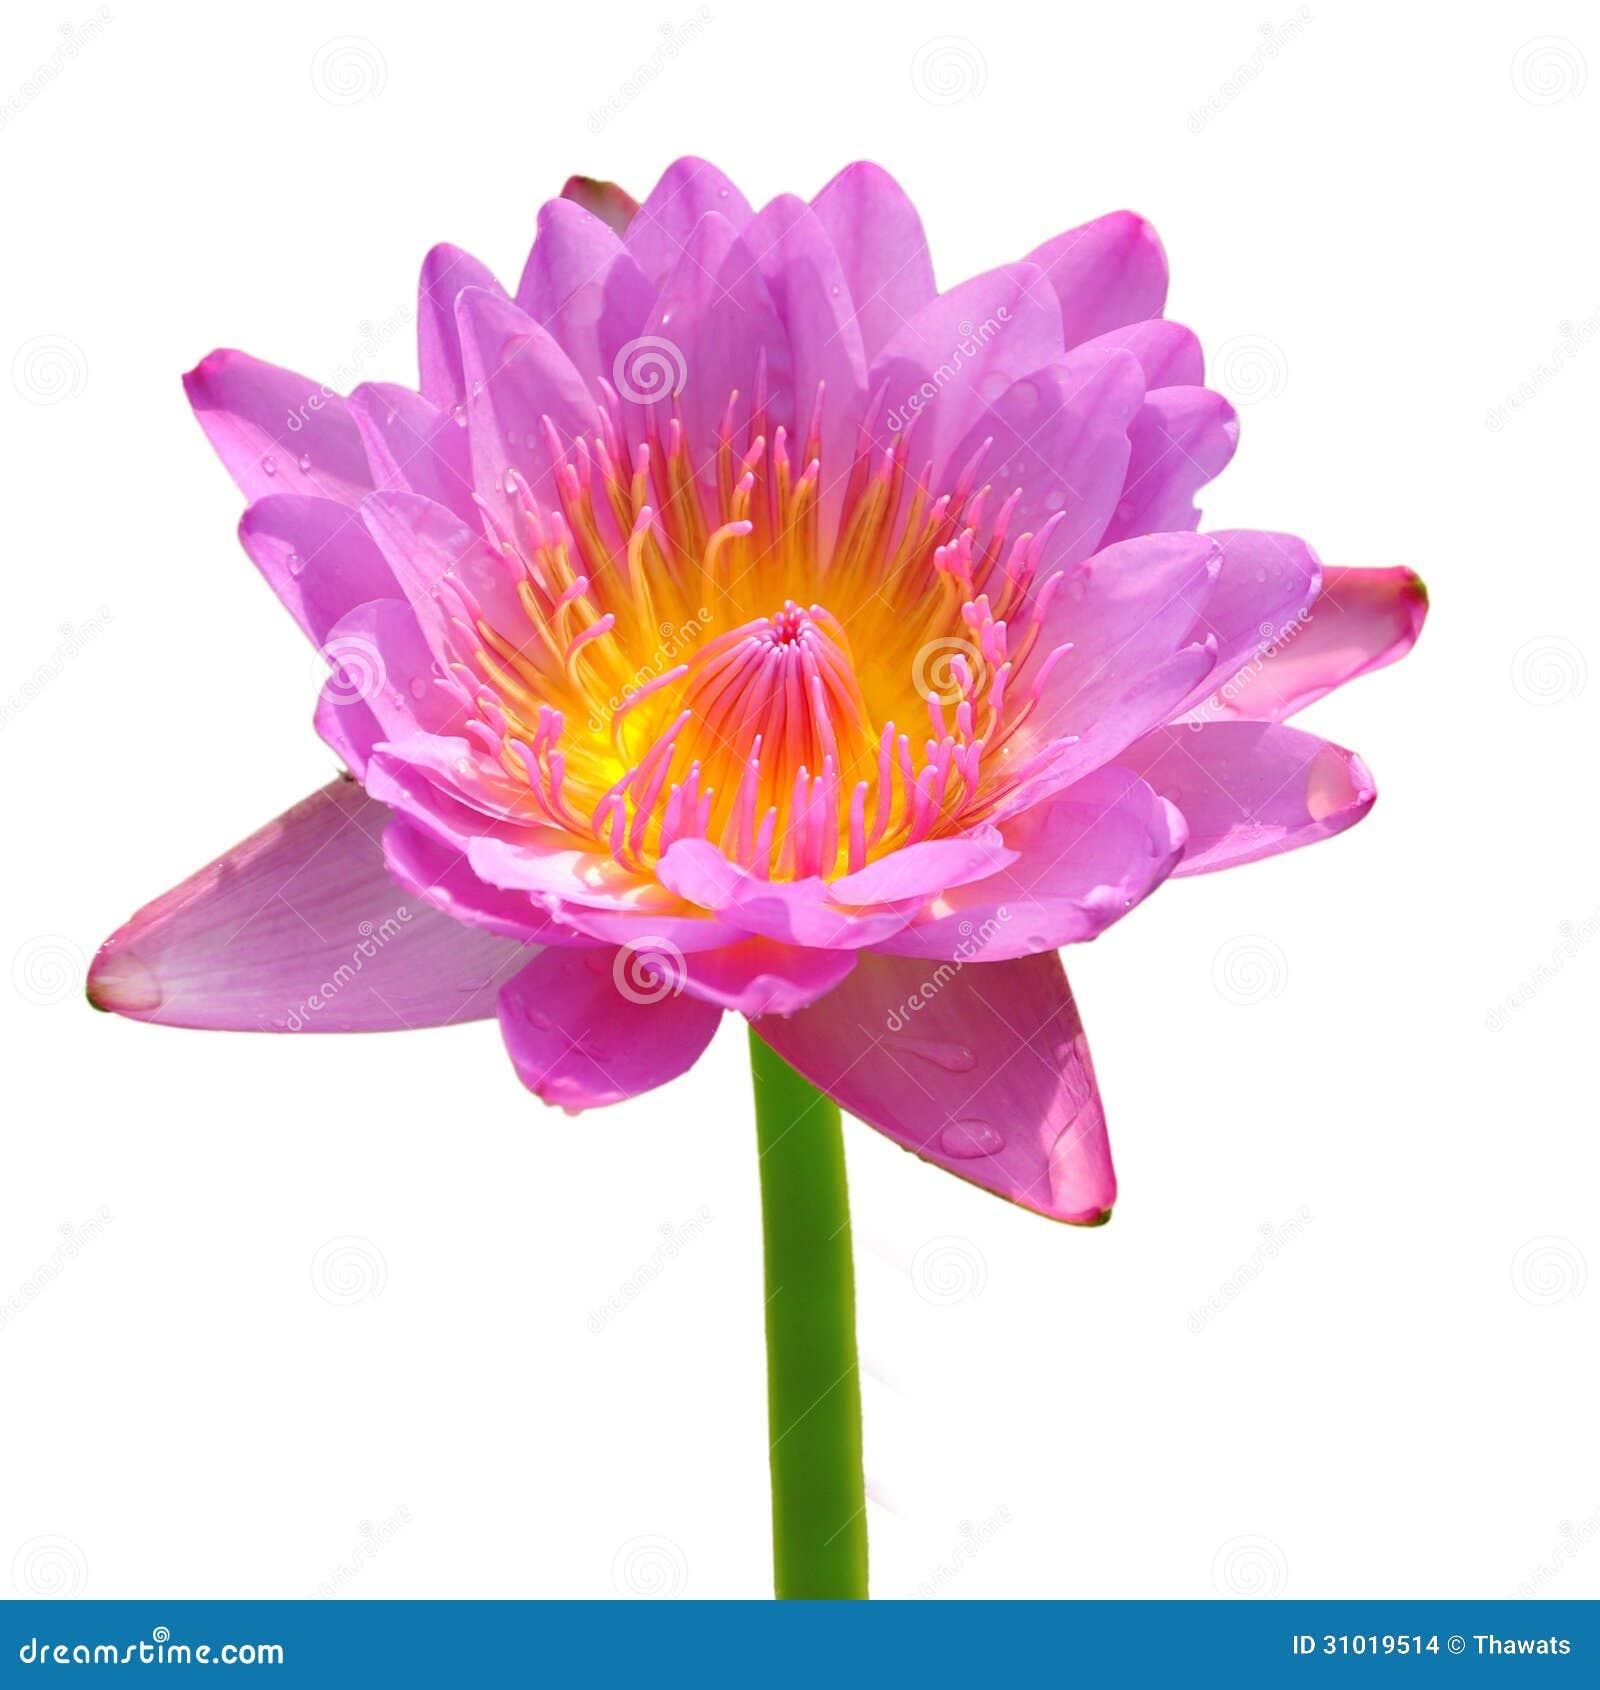 Pink lotus flower stock photo image of taiwan beautiful 31019514 beautiful lotussingle lotus flower isolated on white background izmirmasajfo